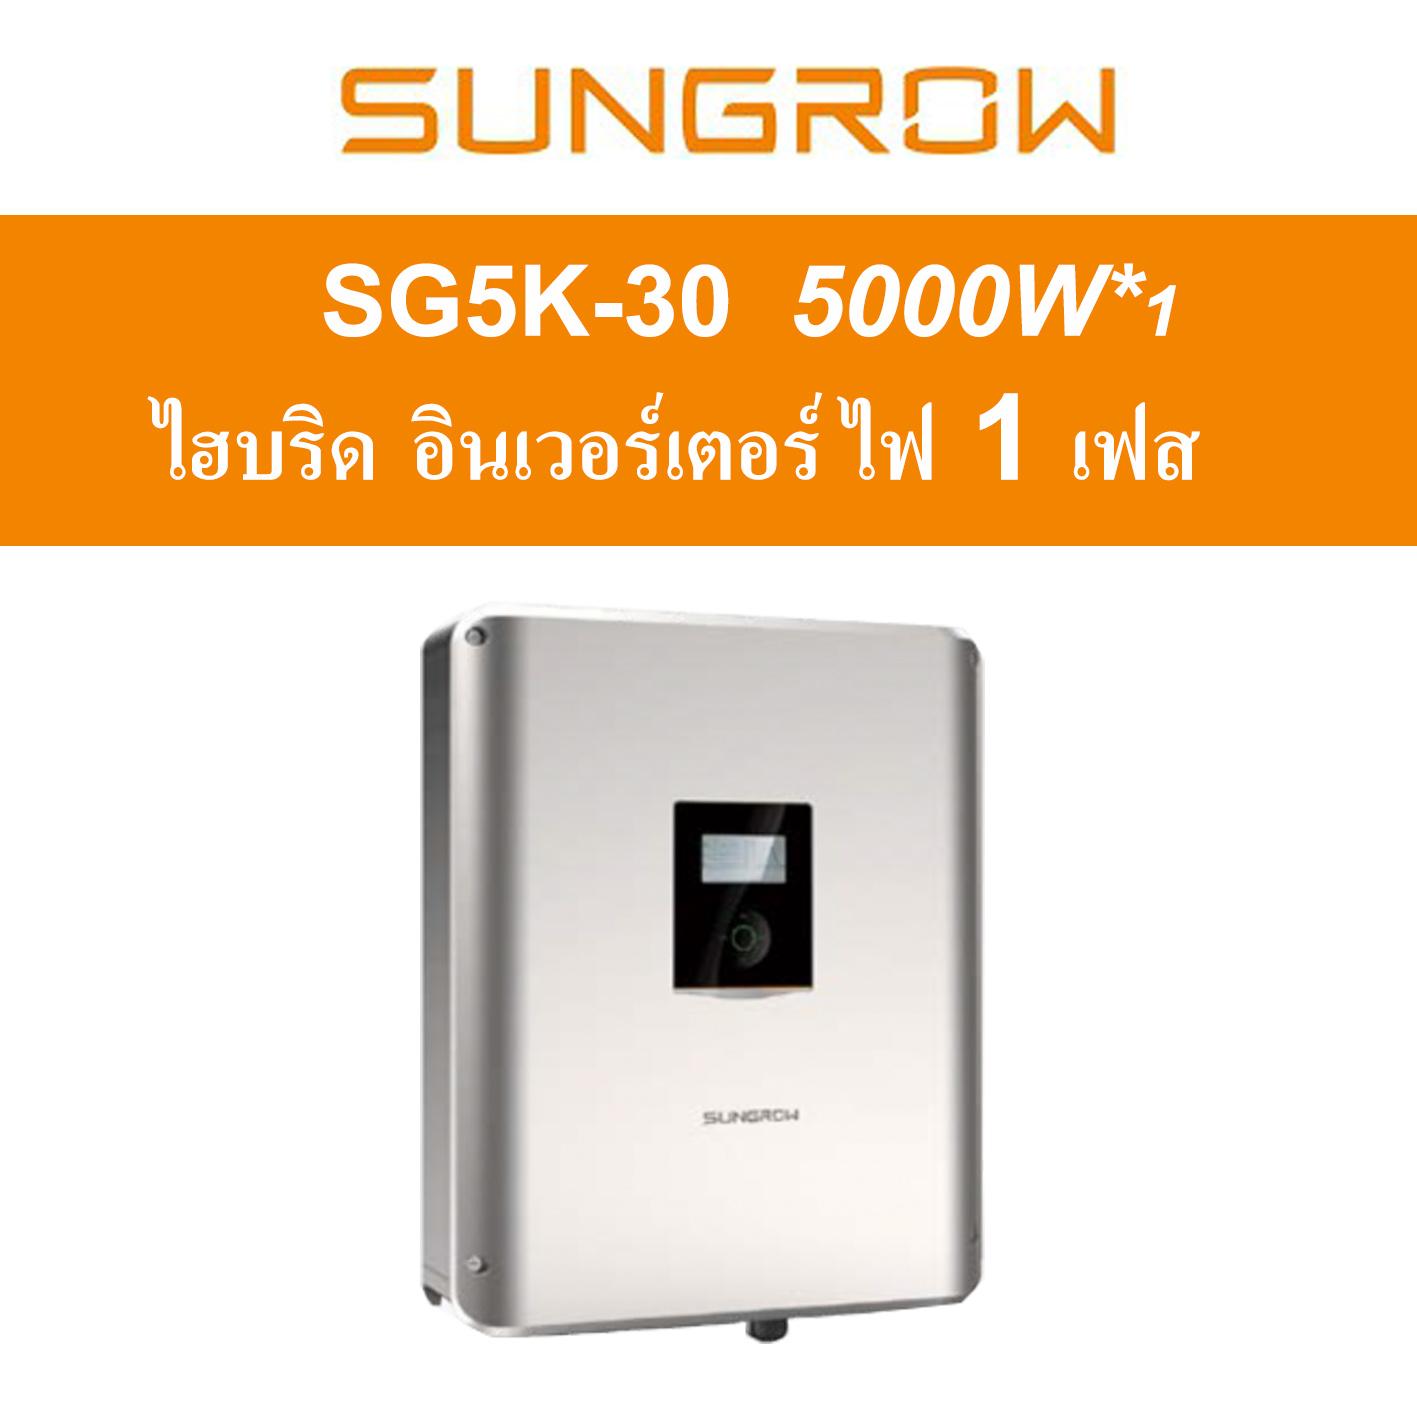 Sungrow  Hybrid SH5K-30 5kW